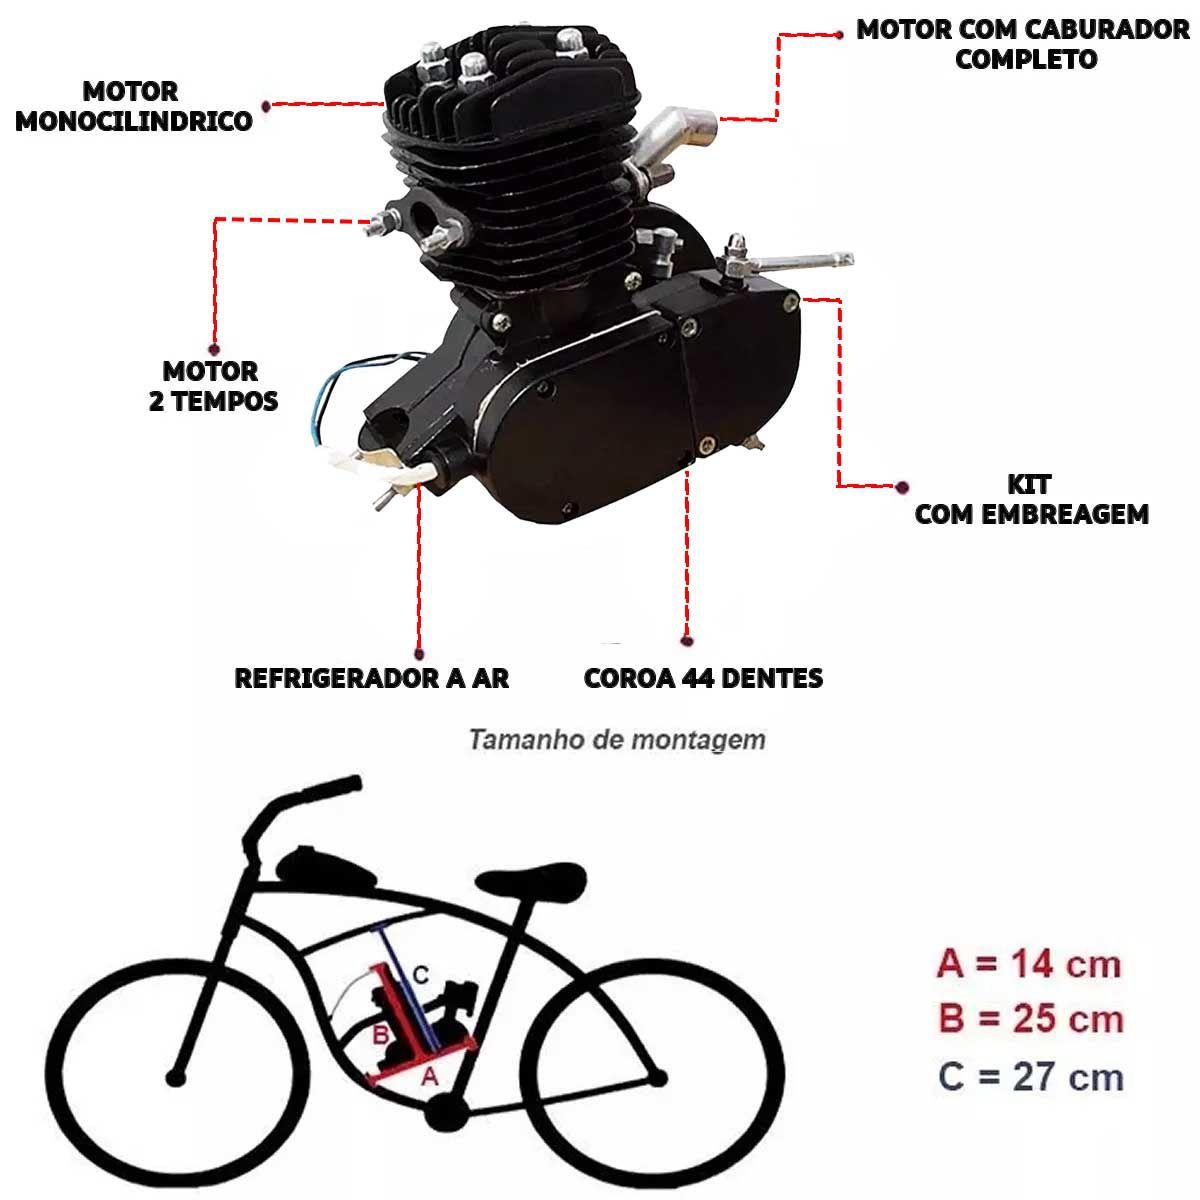 Motor para Bicicleta 2 Tempos Bike Motorizada 80cc 3hp / 5000 Rpm kit Completo Moskito a Gasolina Bicimoto Monocilíndrico